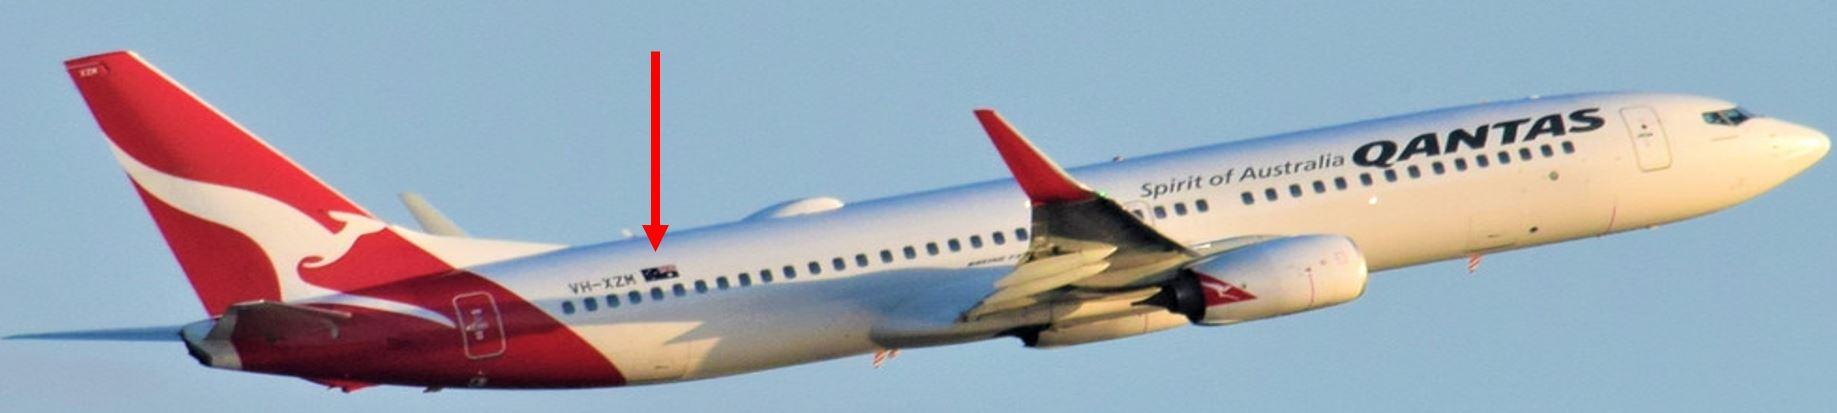 Qantas backwards.JPG